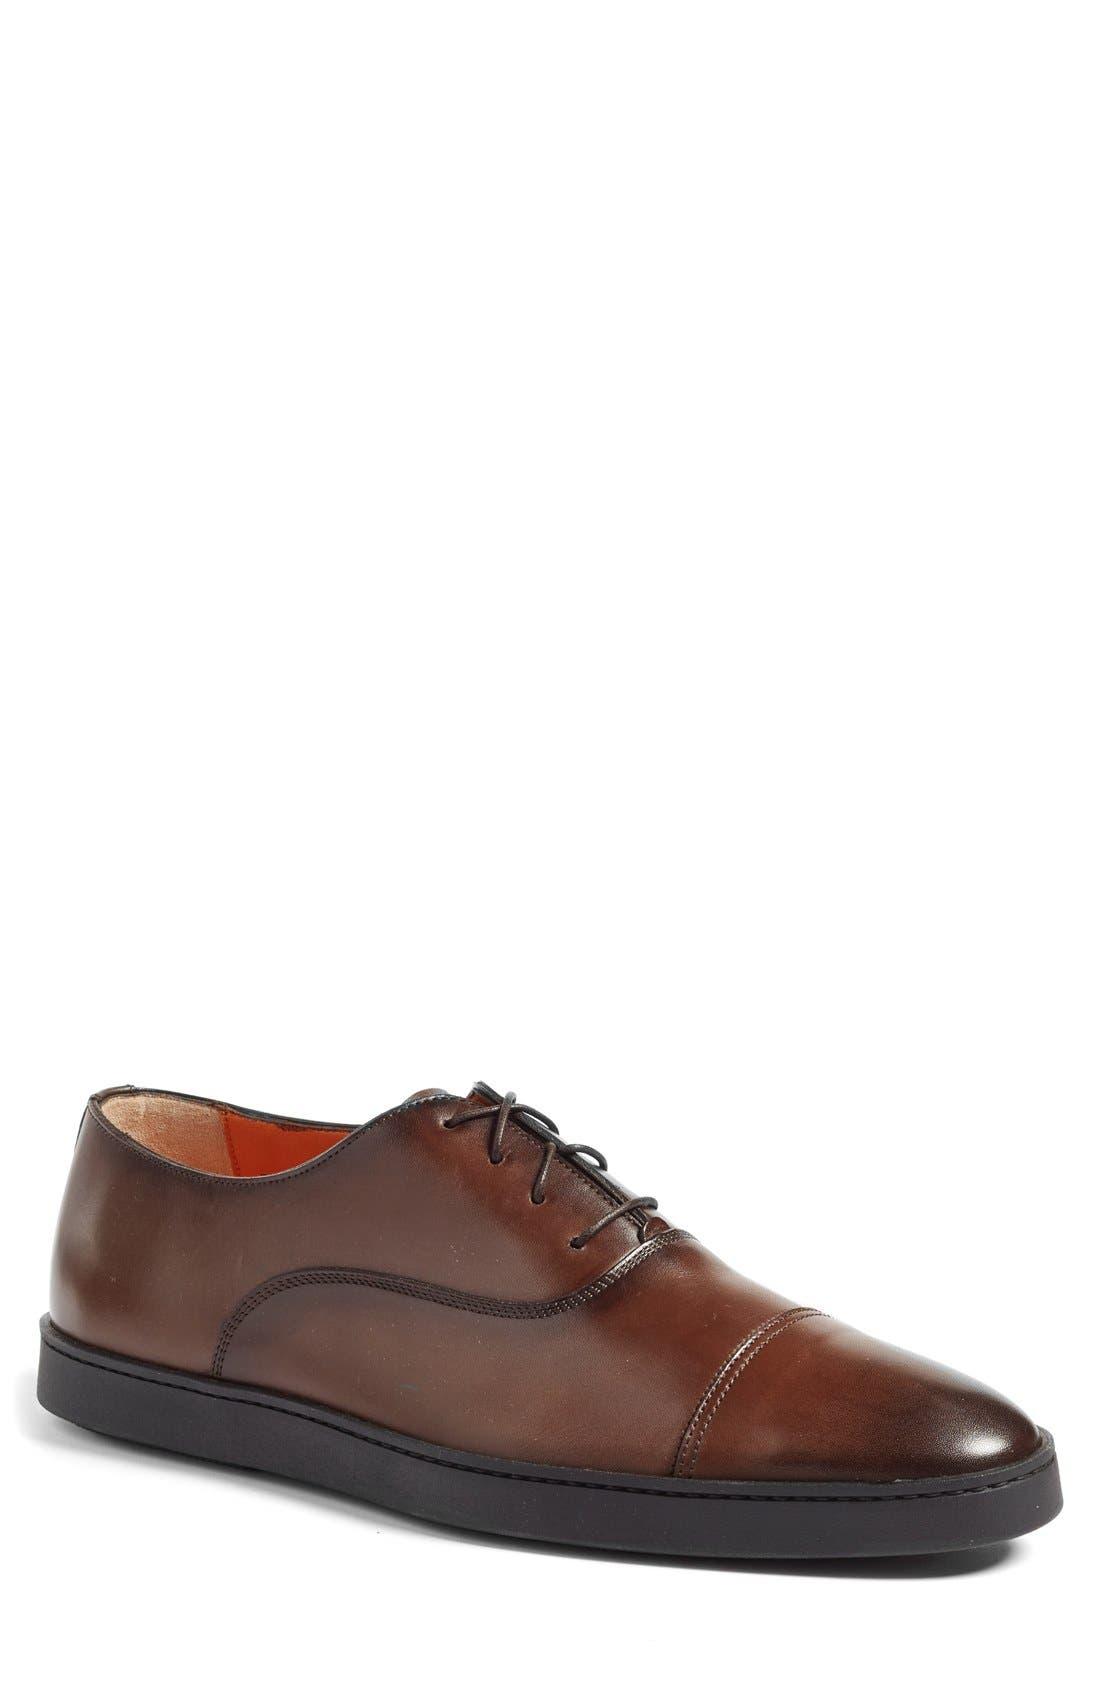 'Durbin' Oxford Sneaker,                             Main thumbnail 1, color,                             209